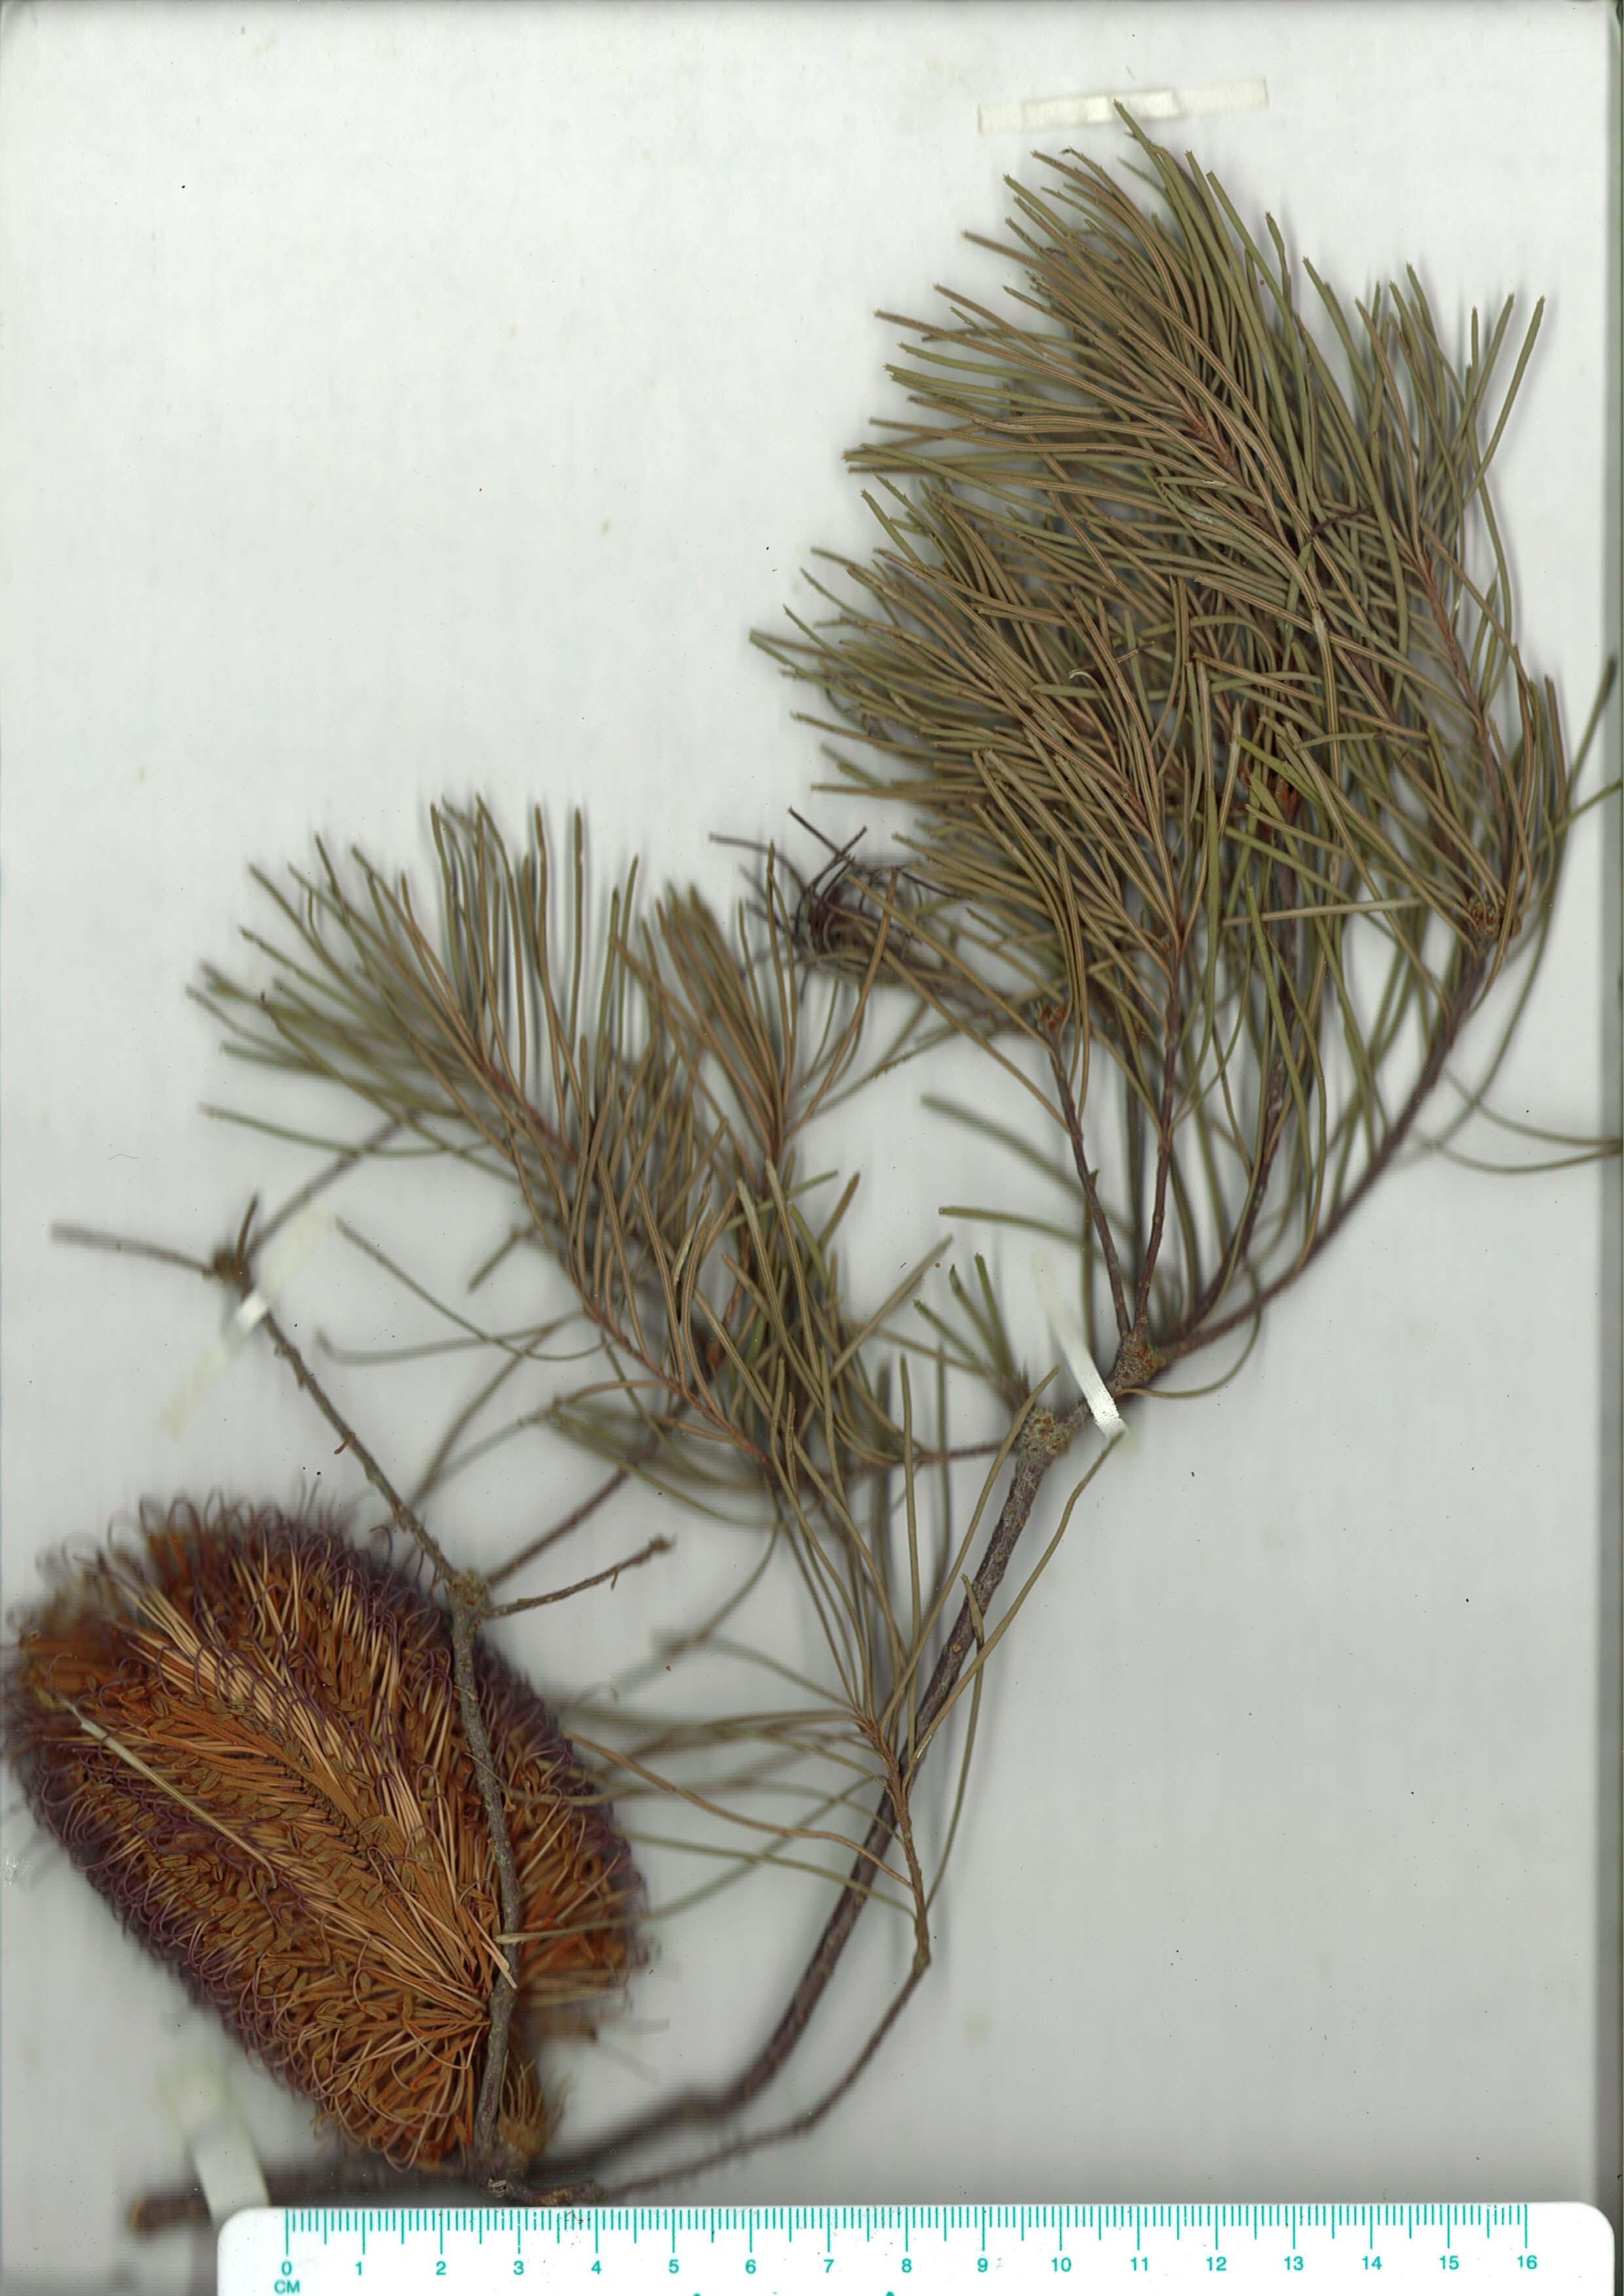 Scanned image of herbarium image of Banksia spinulosavar.spinulosa